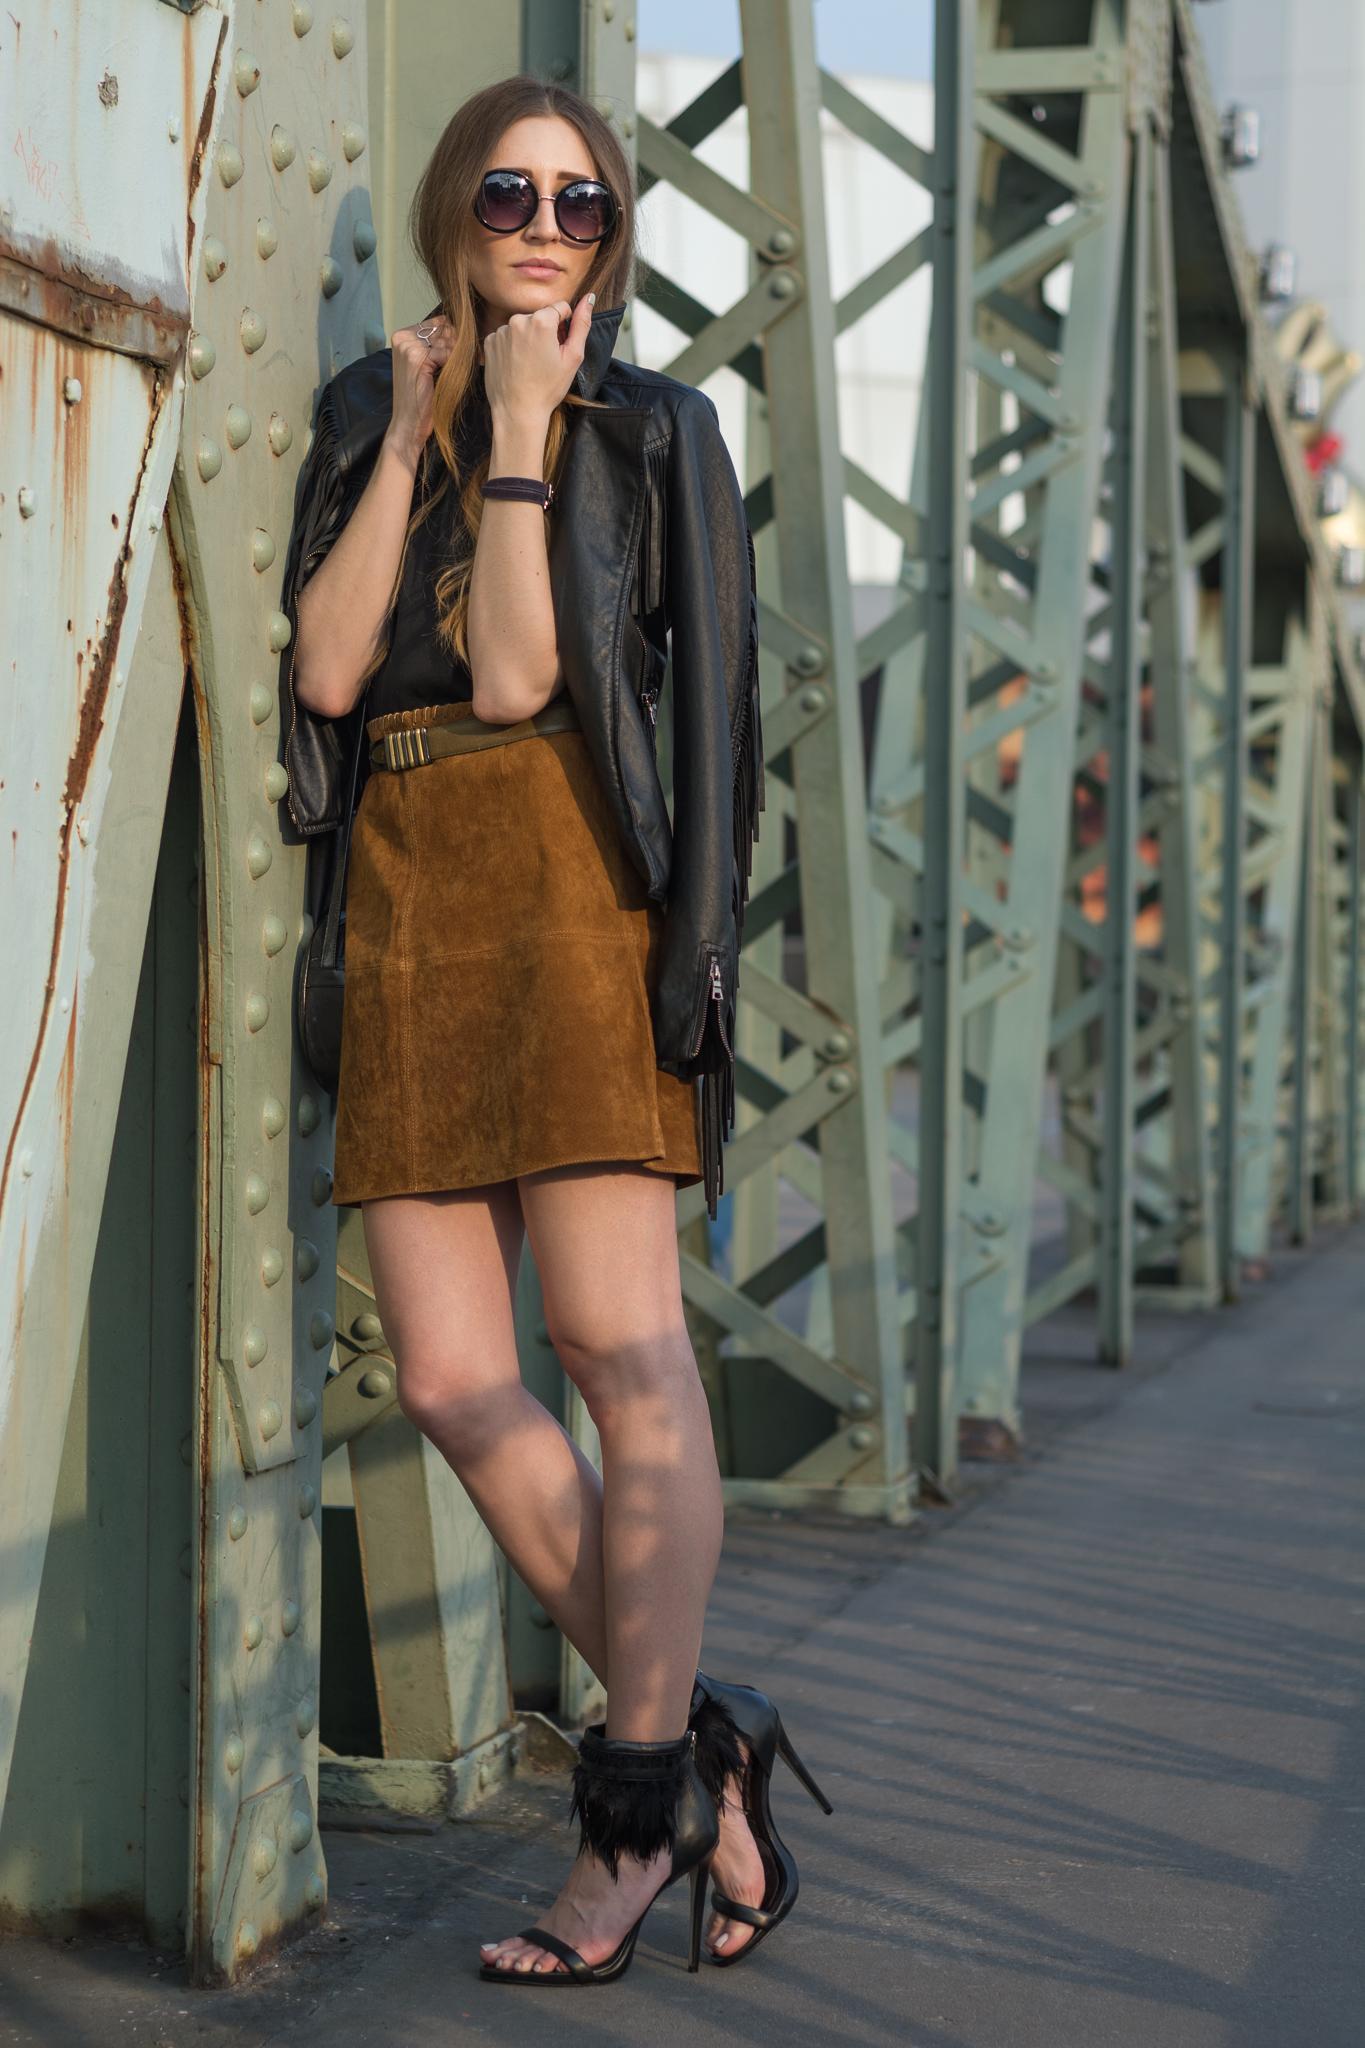 Suede skirt and fringe leather jacket | Lisa Fiege